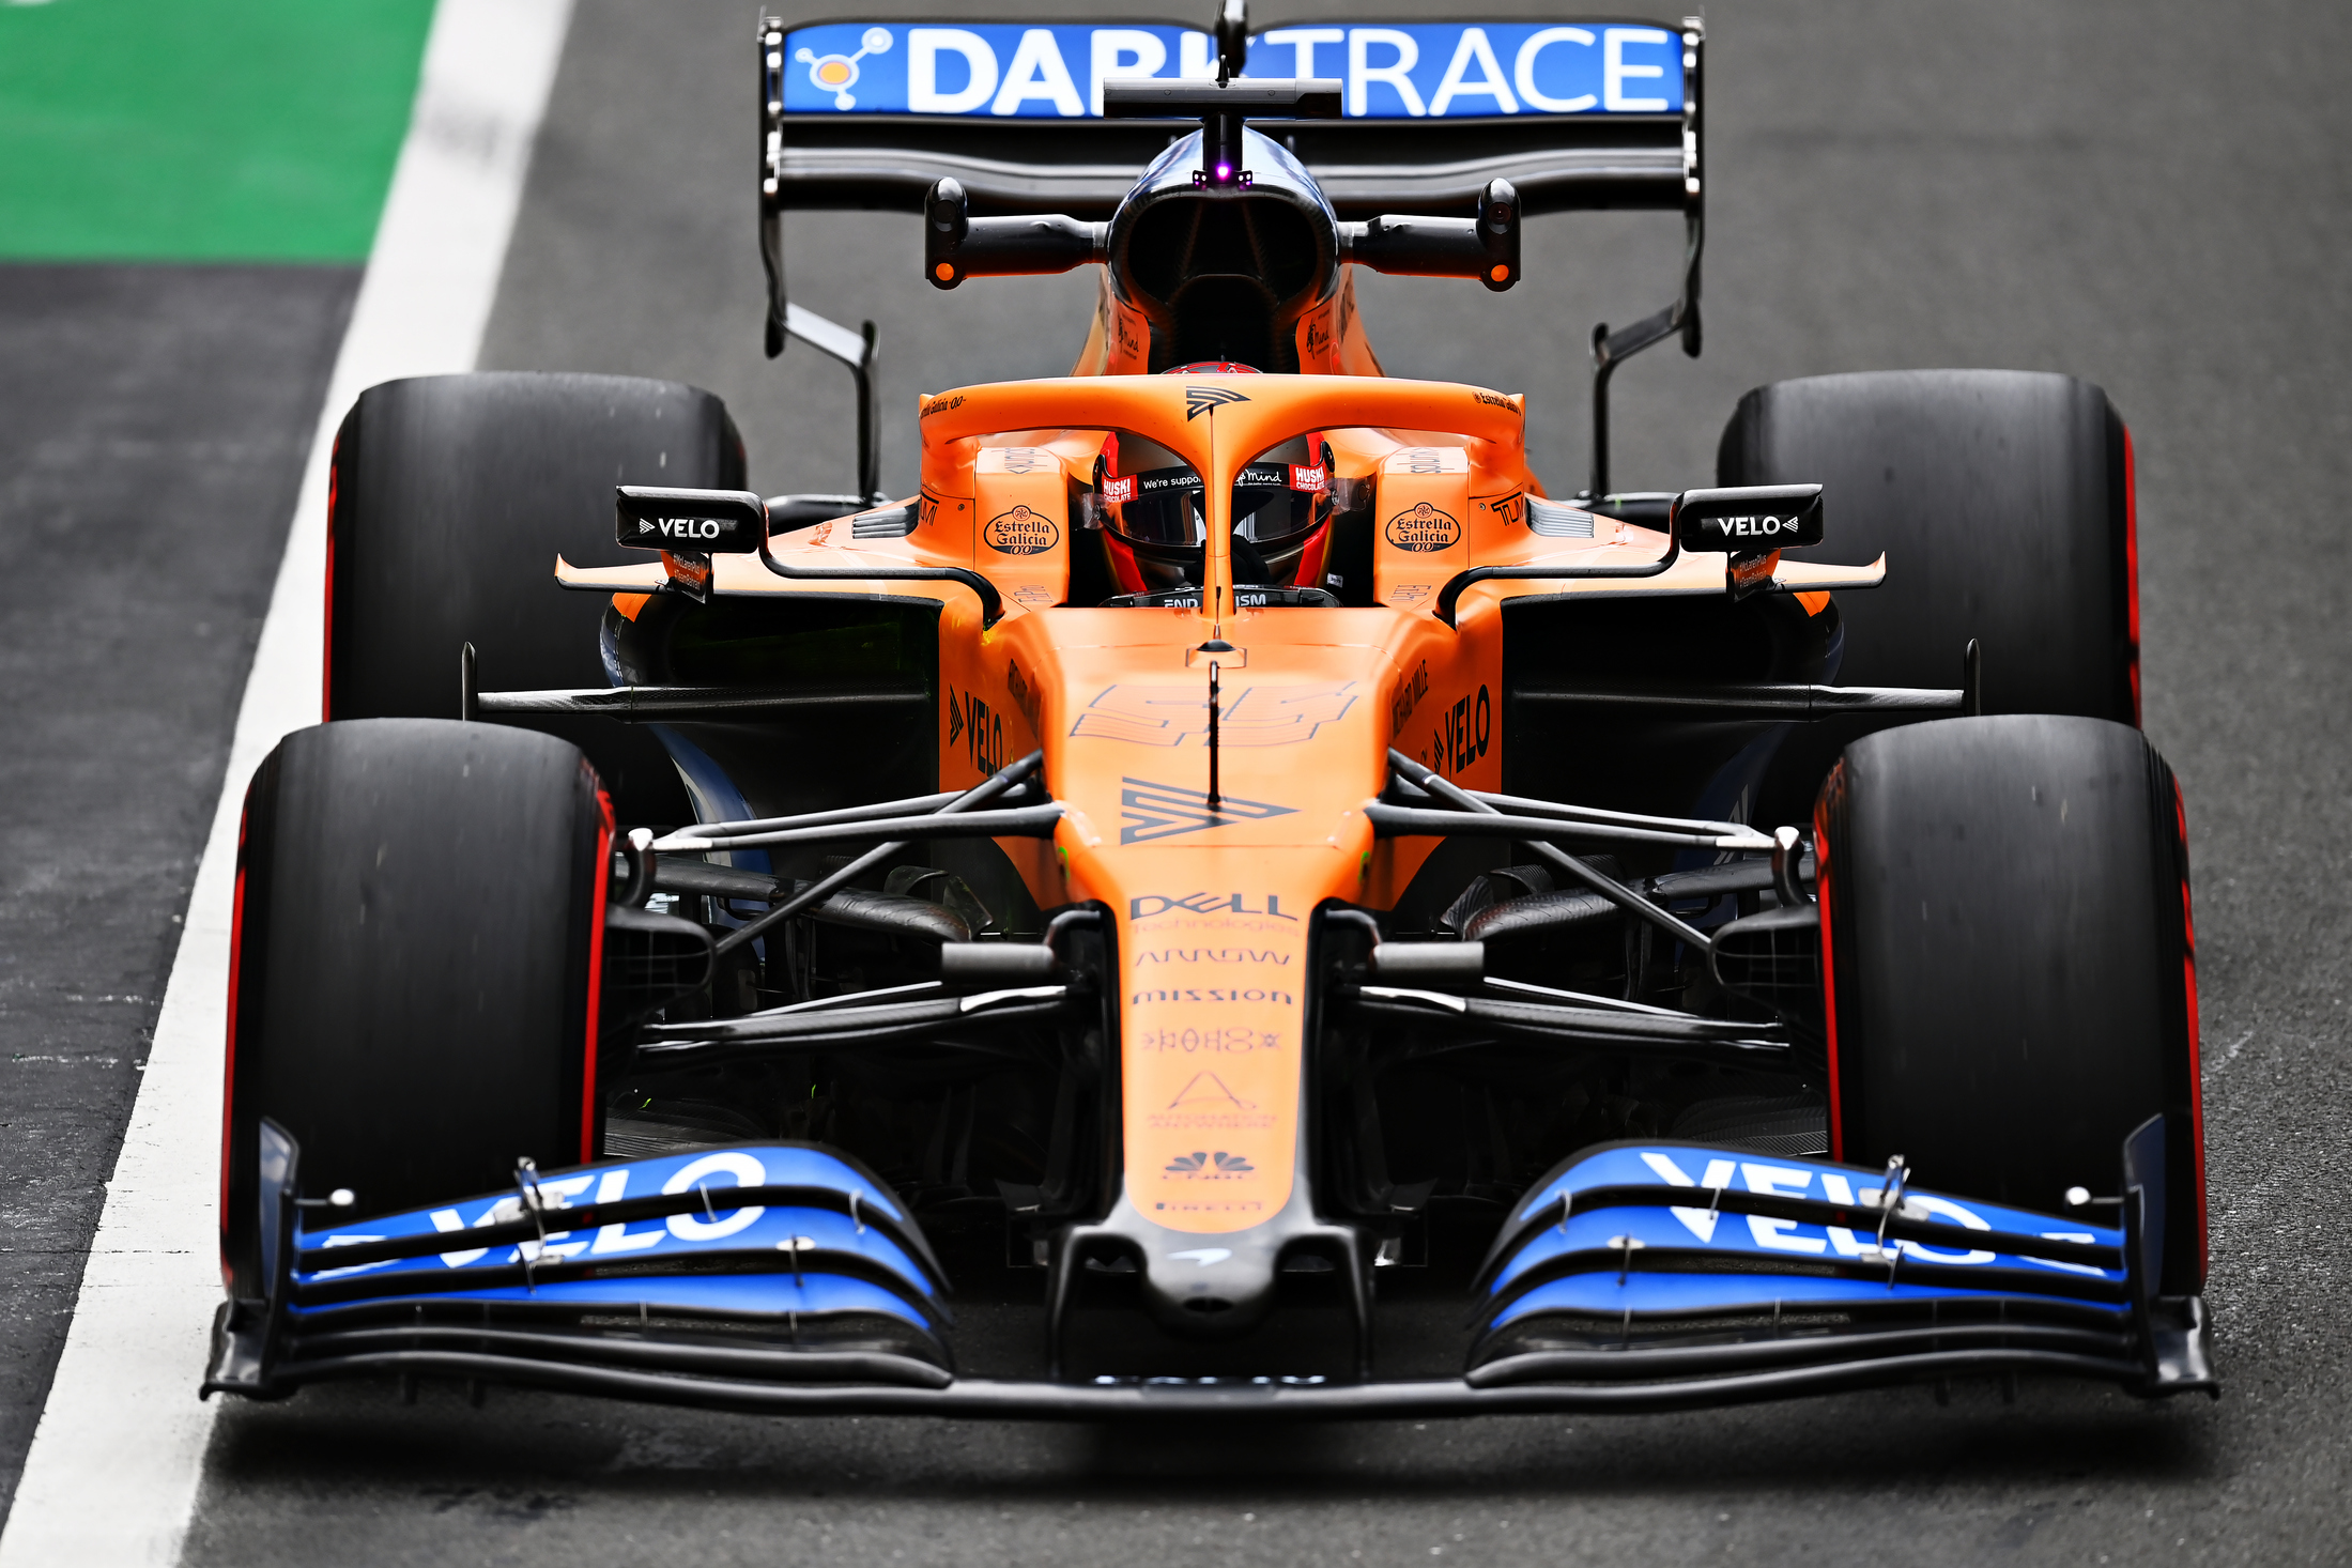 Mclaren S Carlos Sainz Predicts Tyre Choice Headache In Qualifying Formula 1